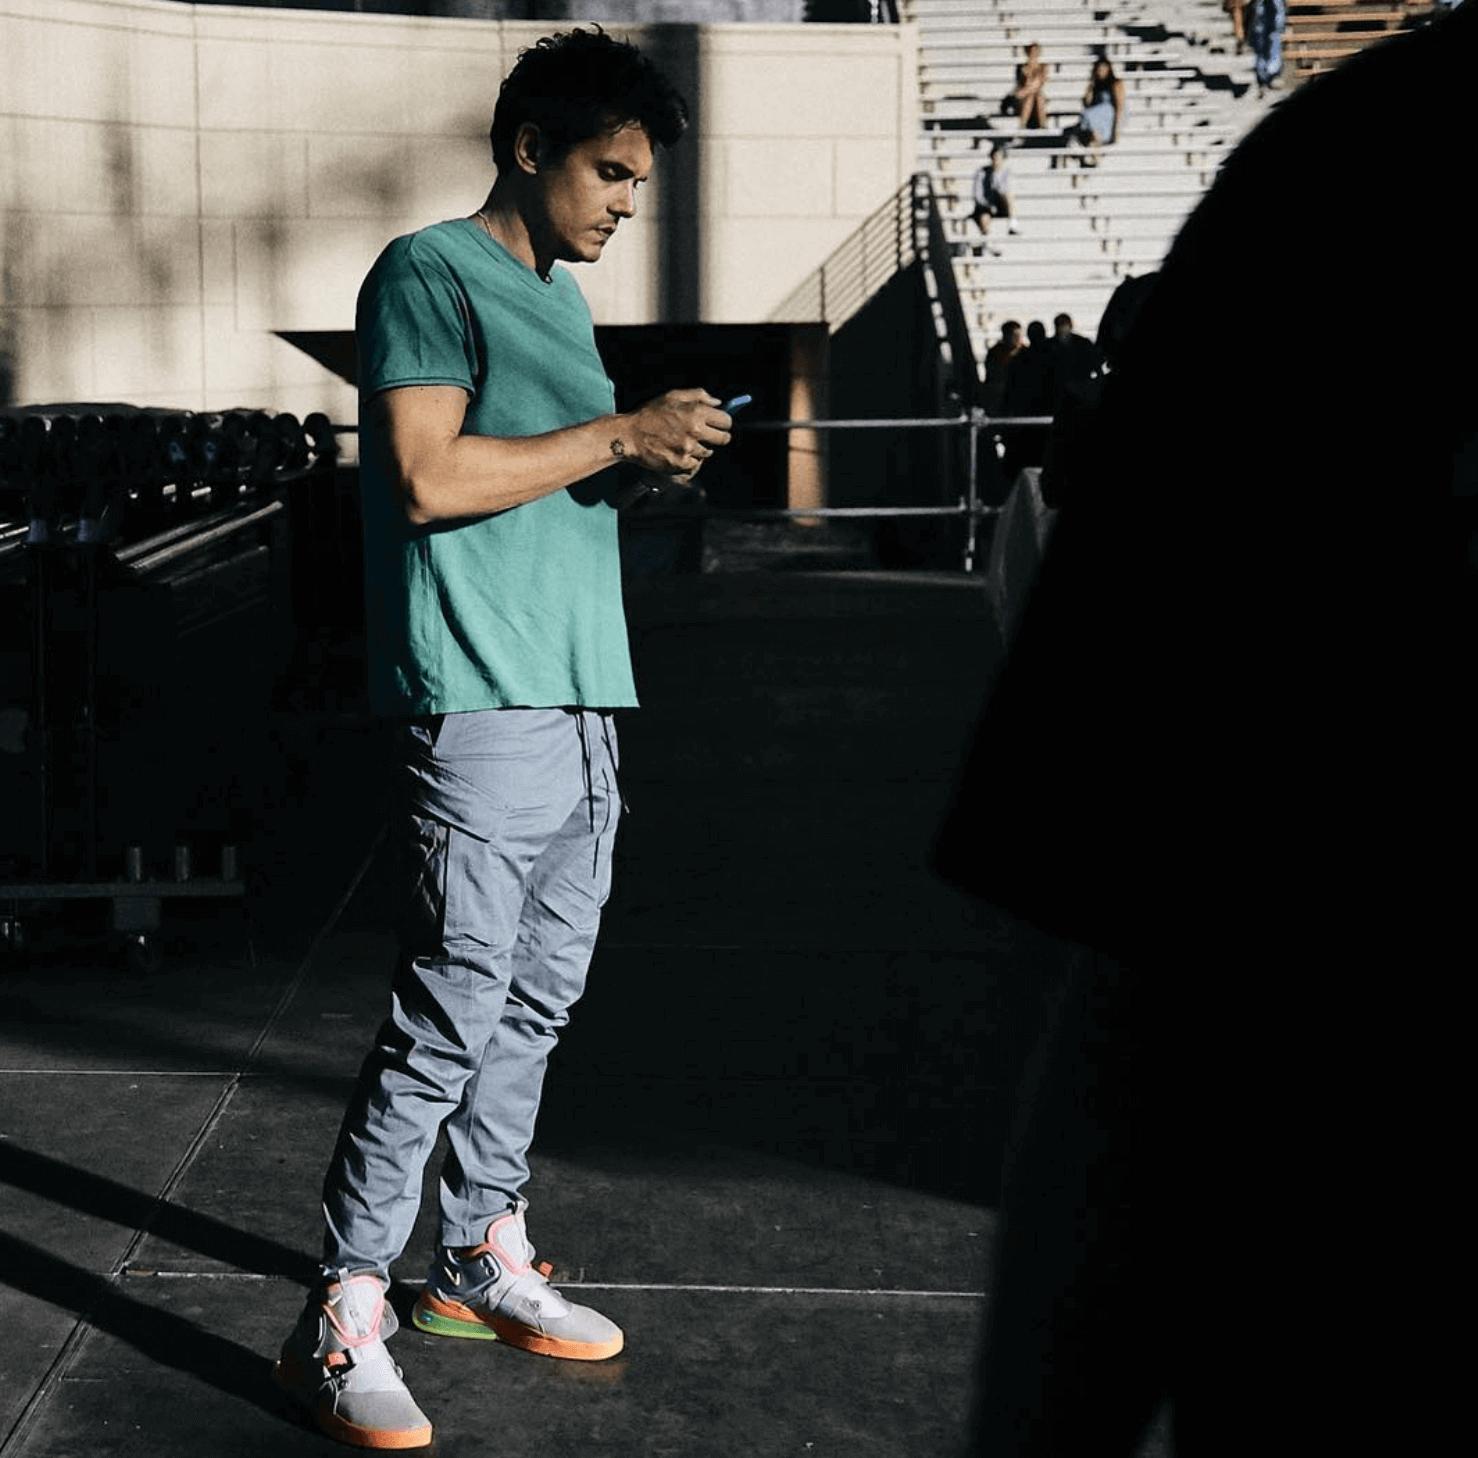 John Mayer in the Nike Air Force 270